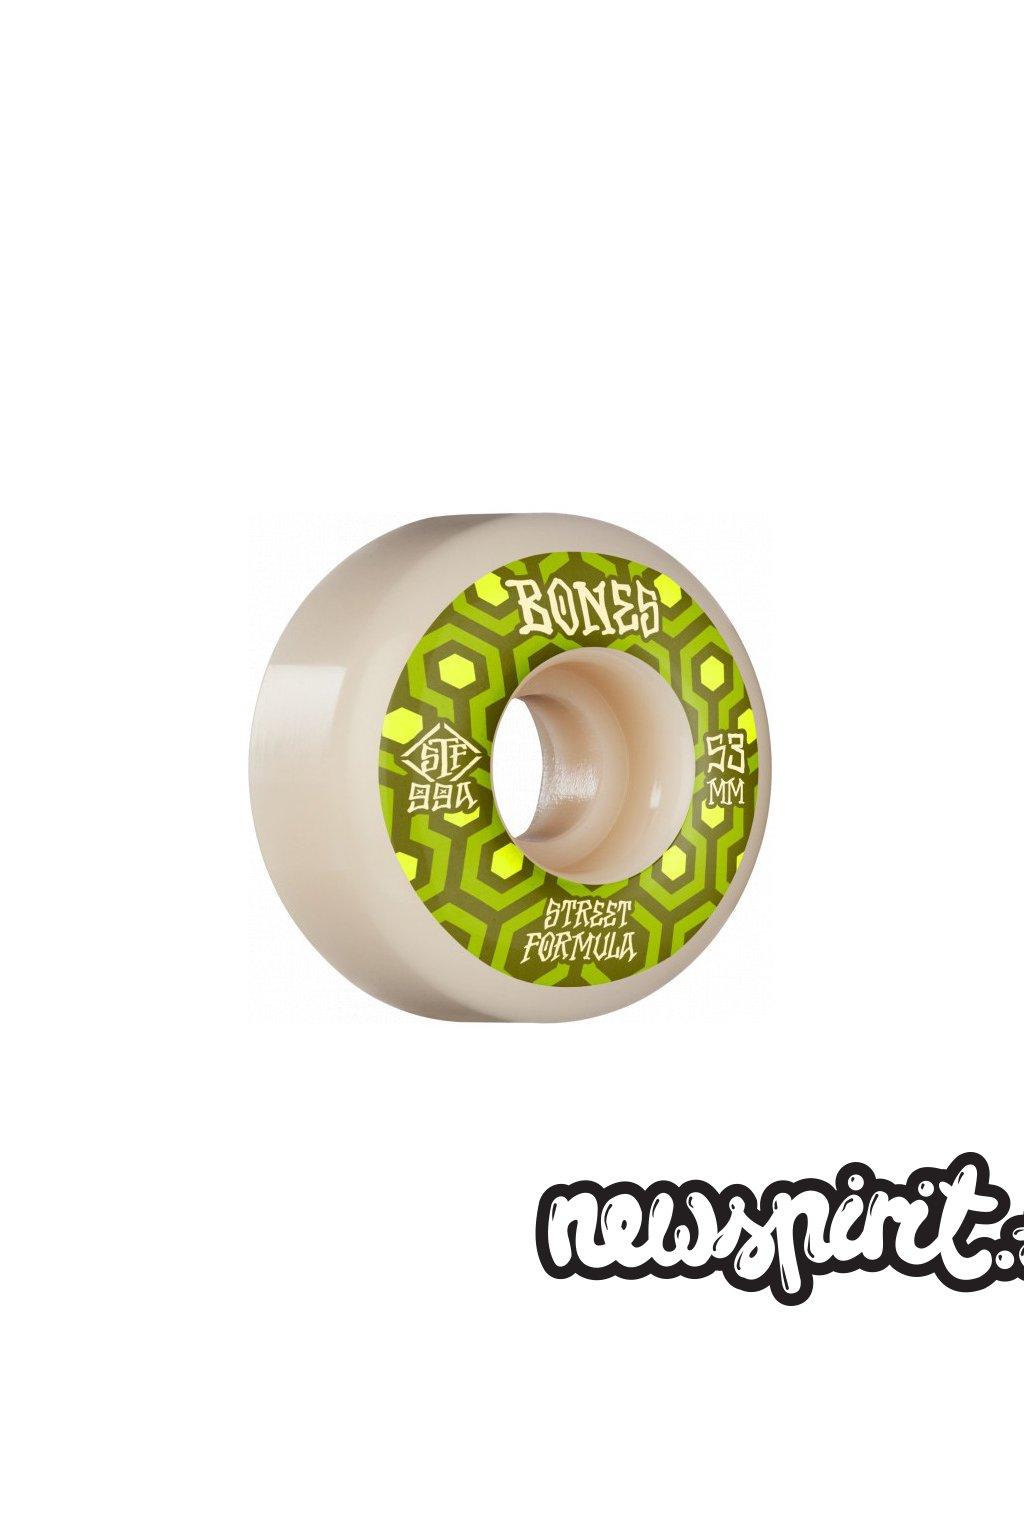 bones wheels stf v1 wscaerv15399a4 1200x1200